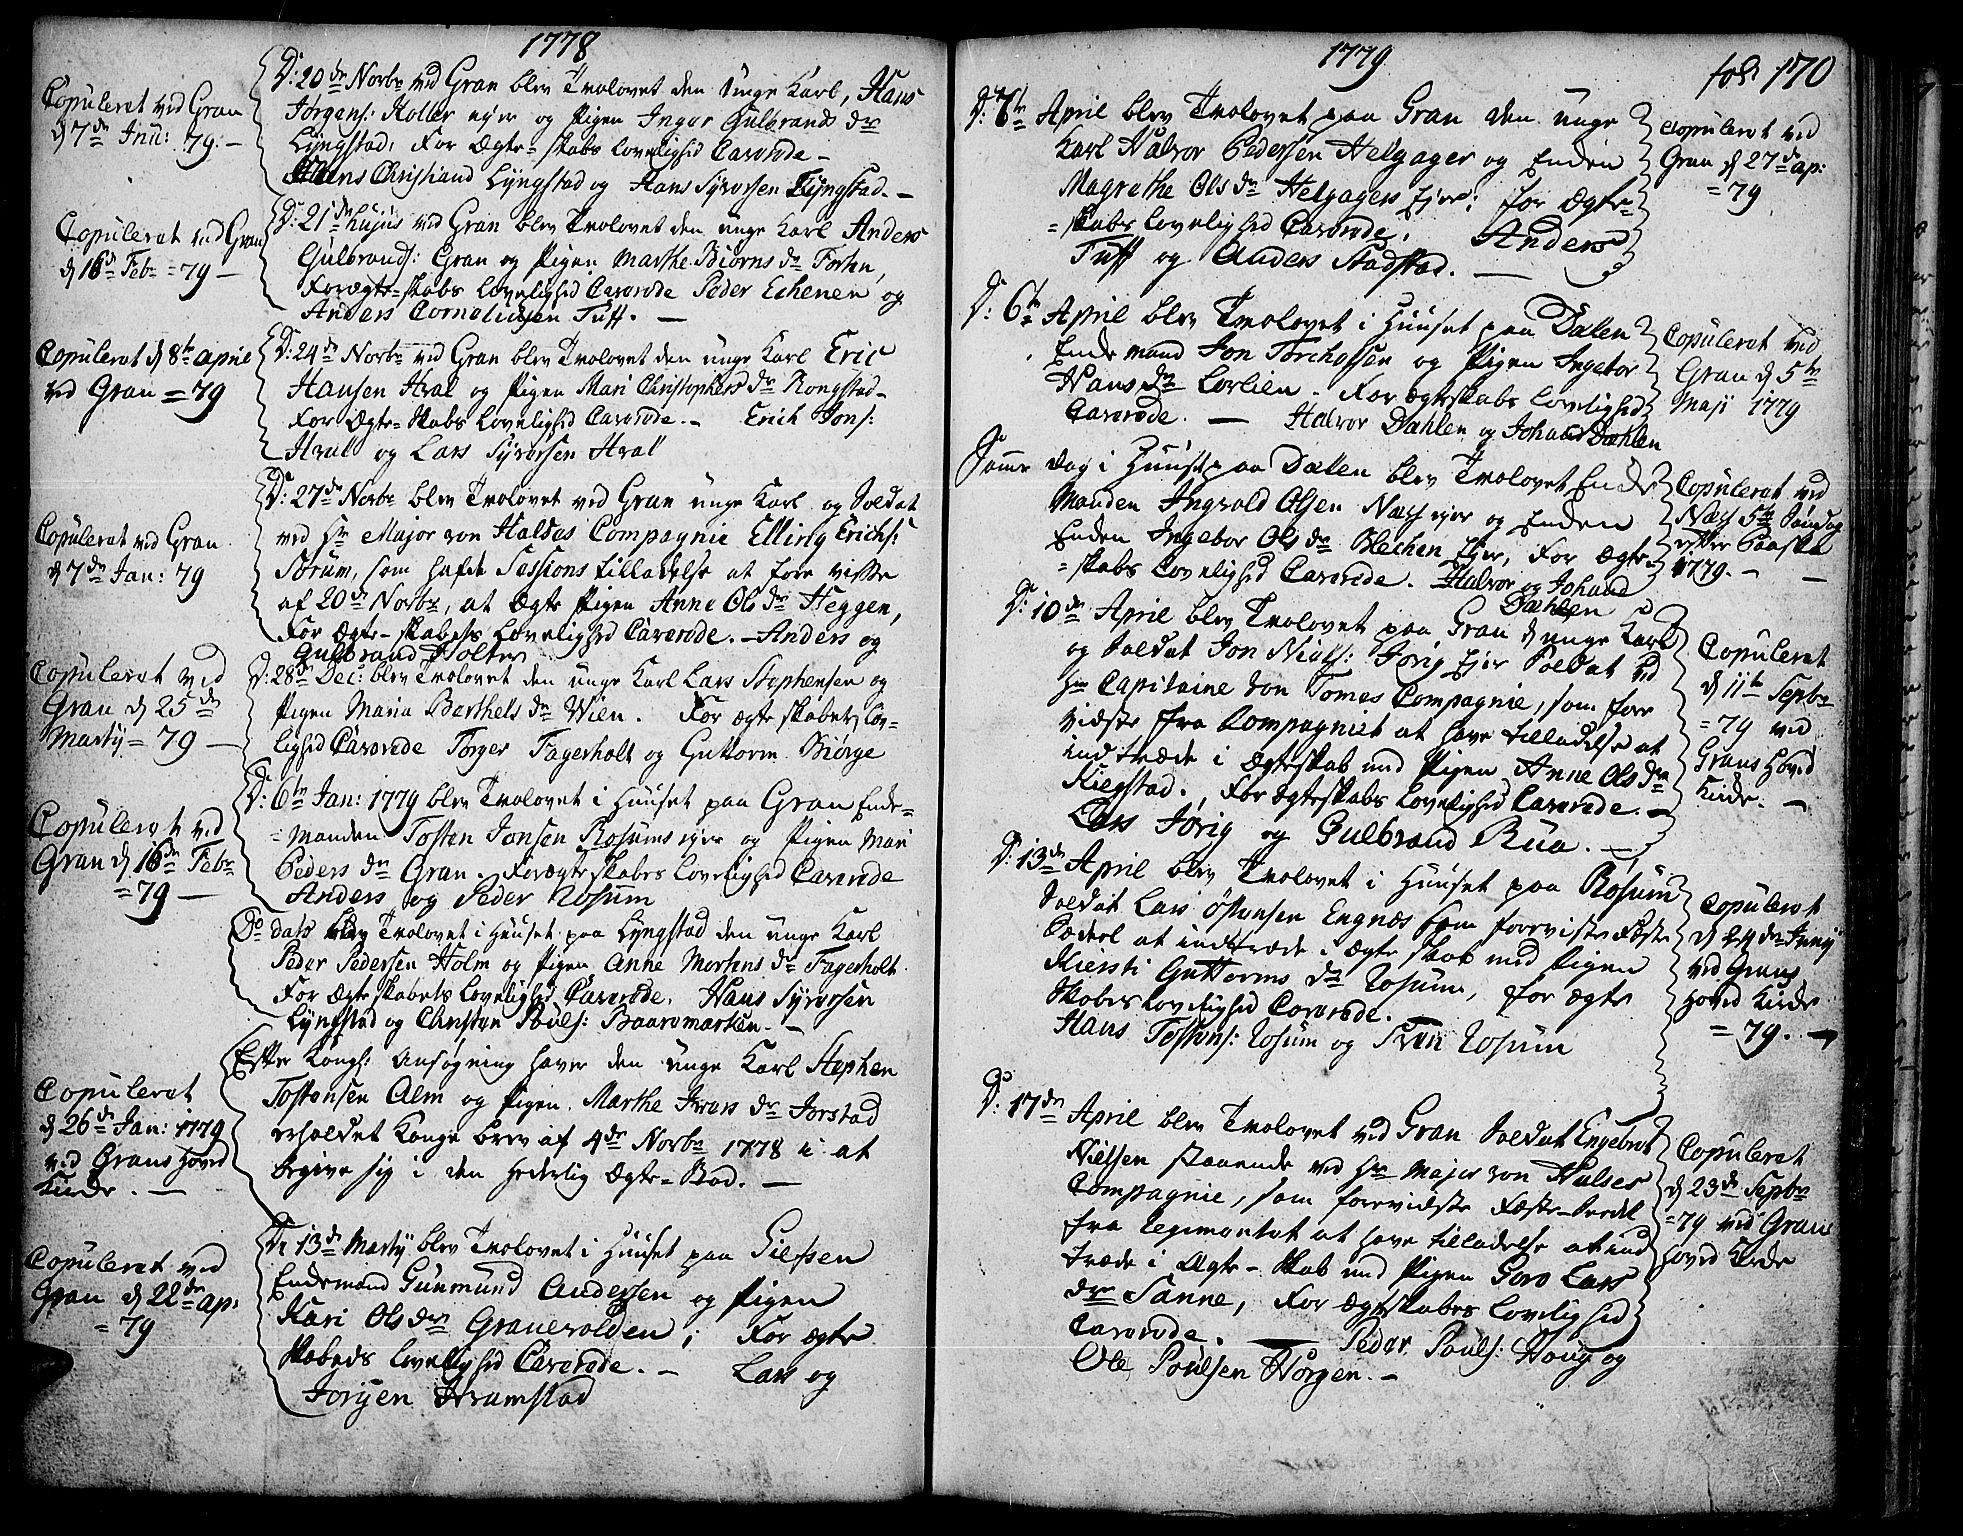 SAH, Gran prestekontor, Ministerialbok nr. 5, 1776-1788, s. 170